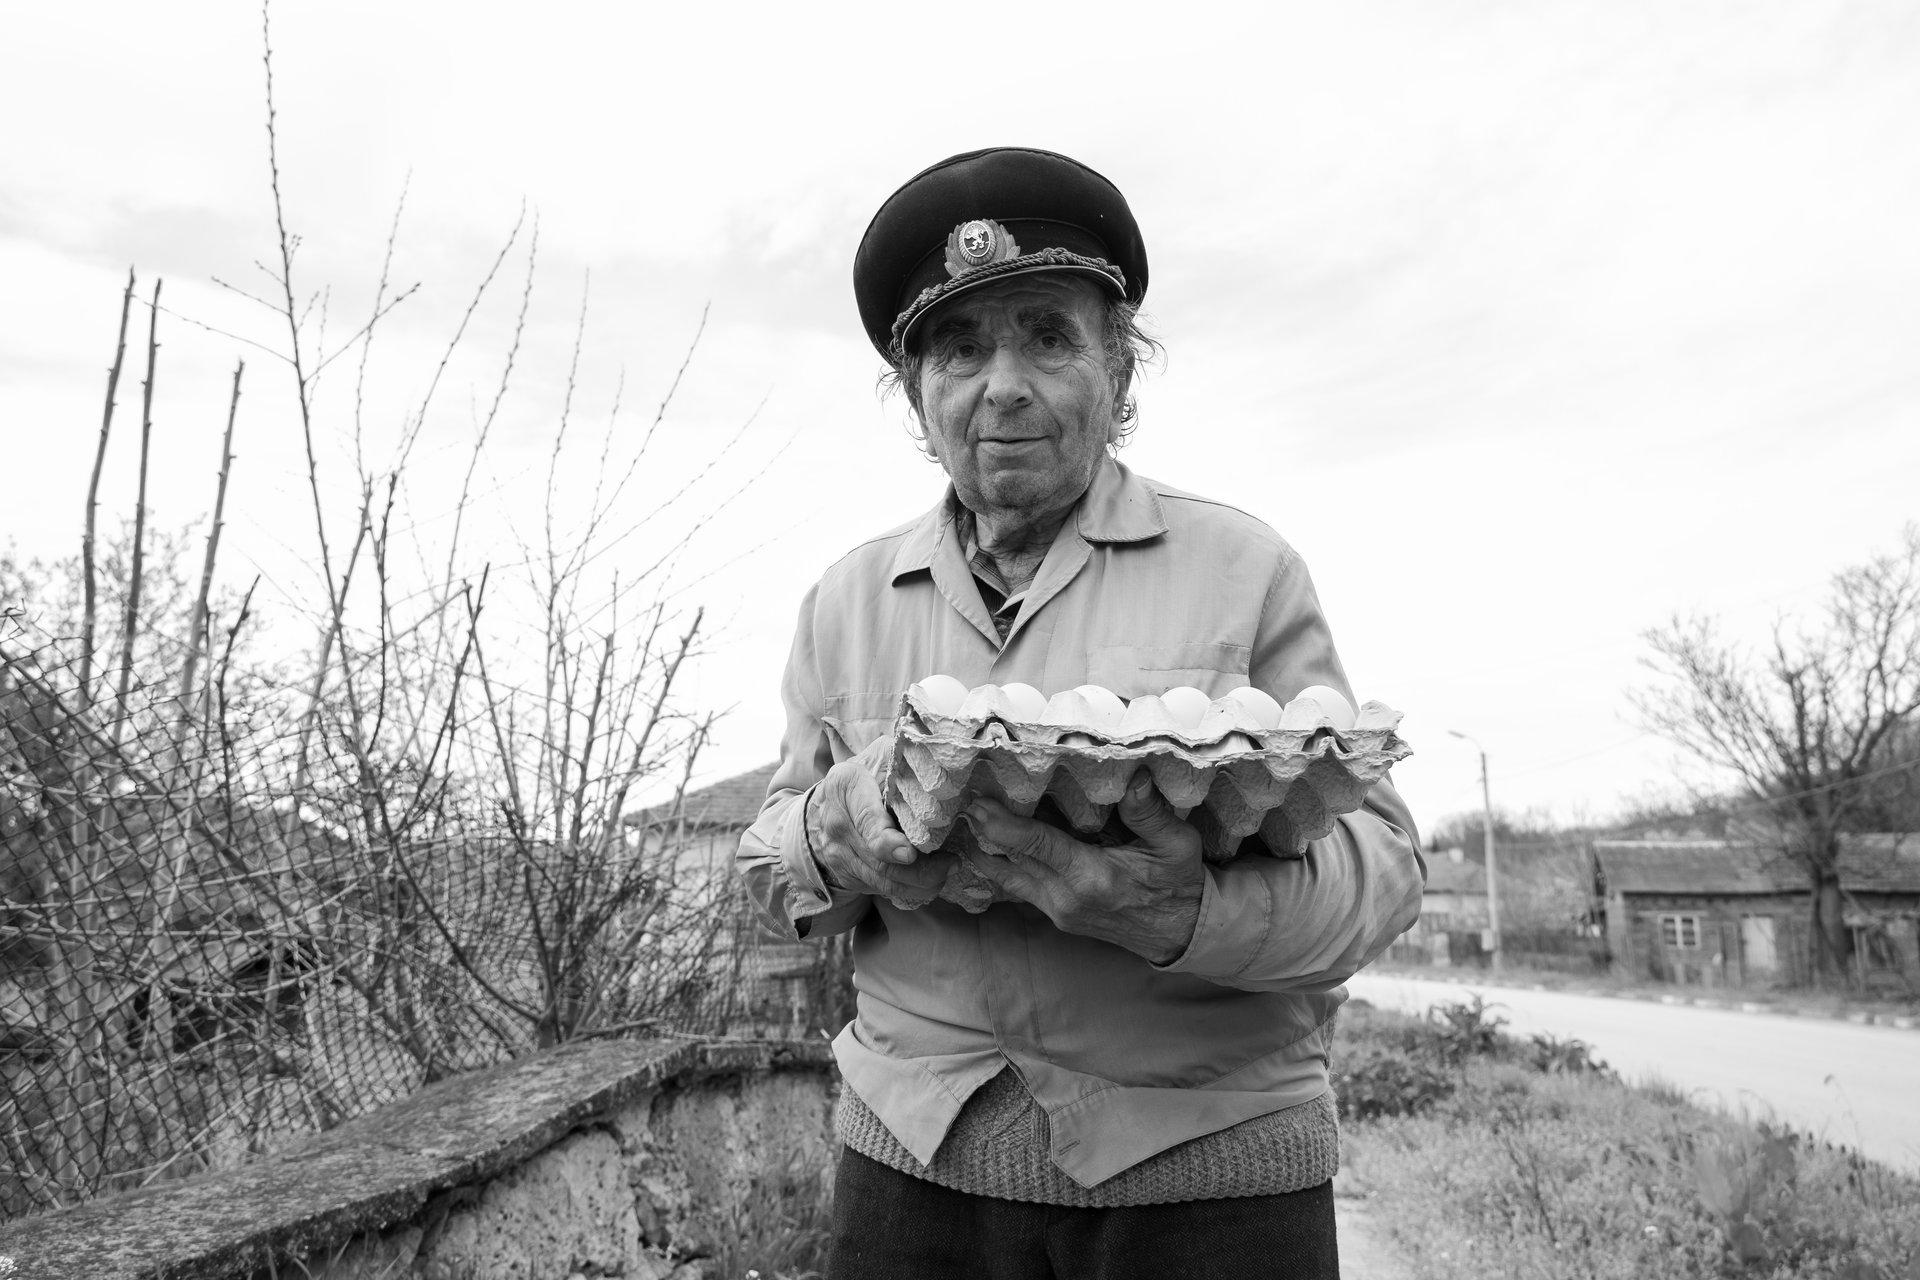 Старецът с яйца | Author Borislav Florov - bobsun1975 | PHOTO FORUM